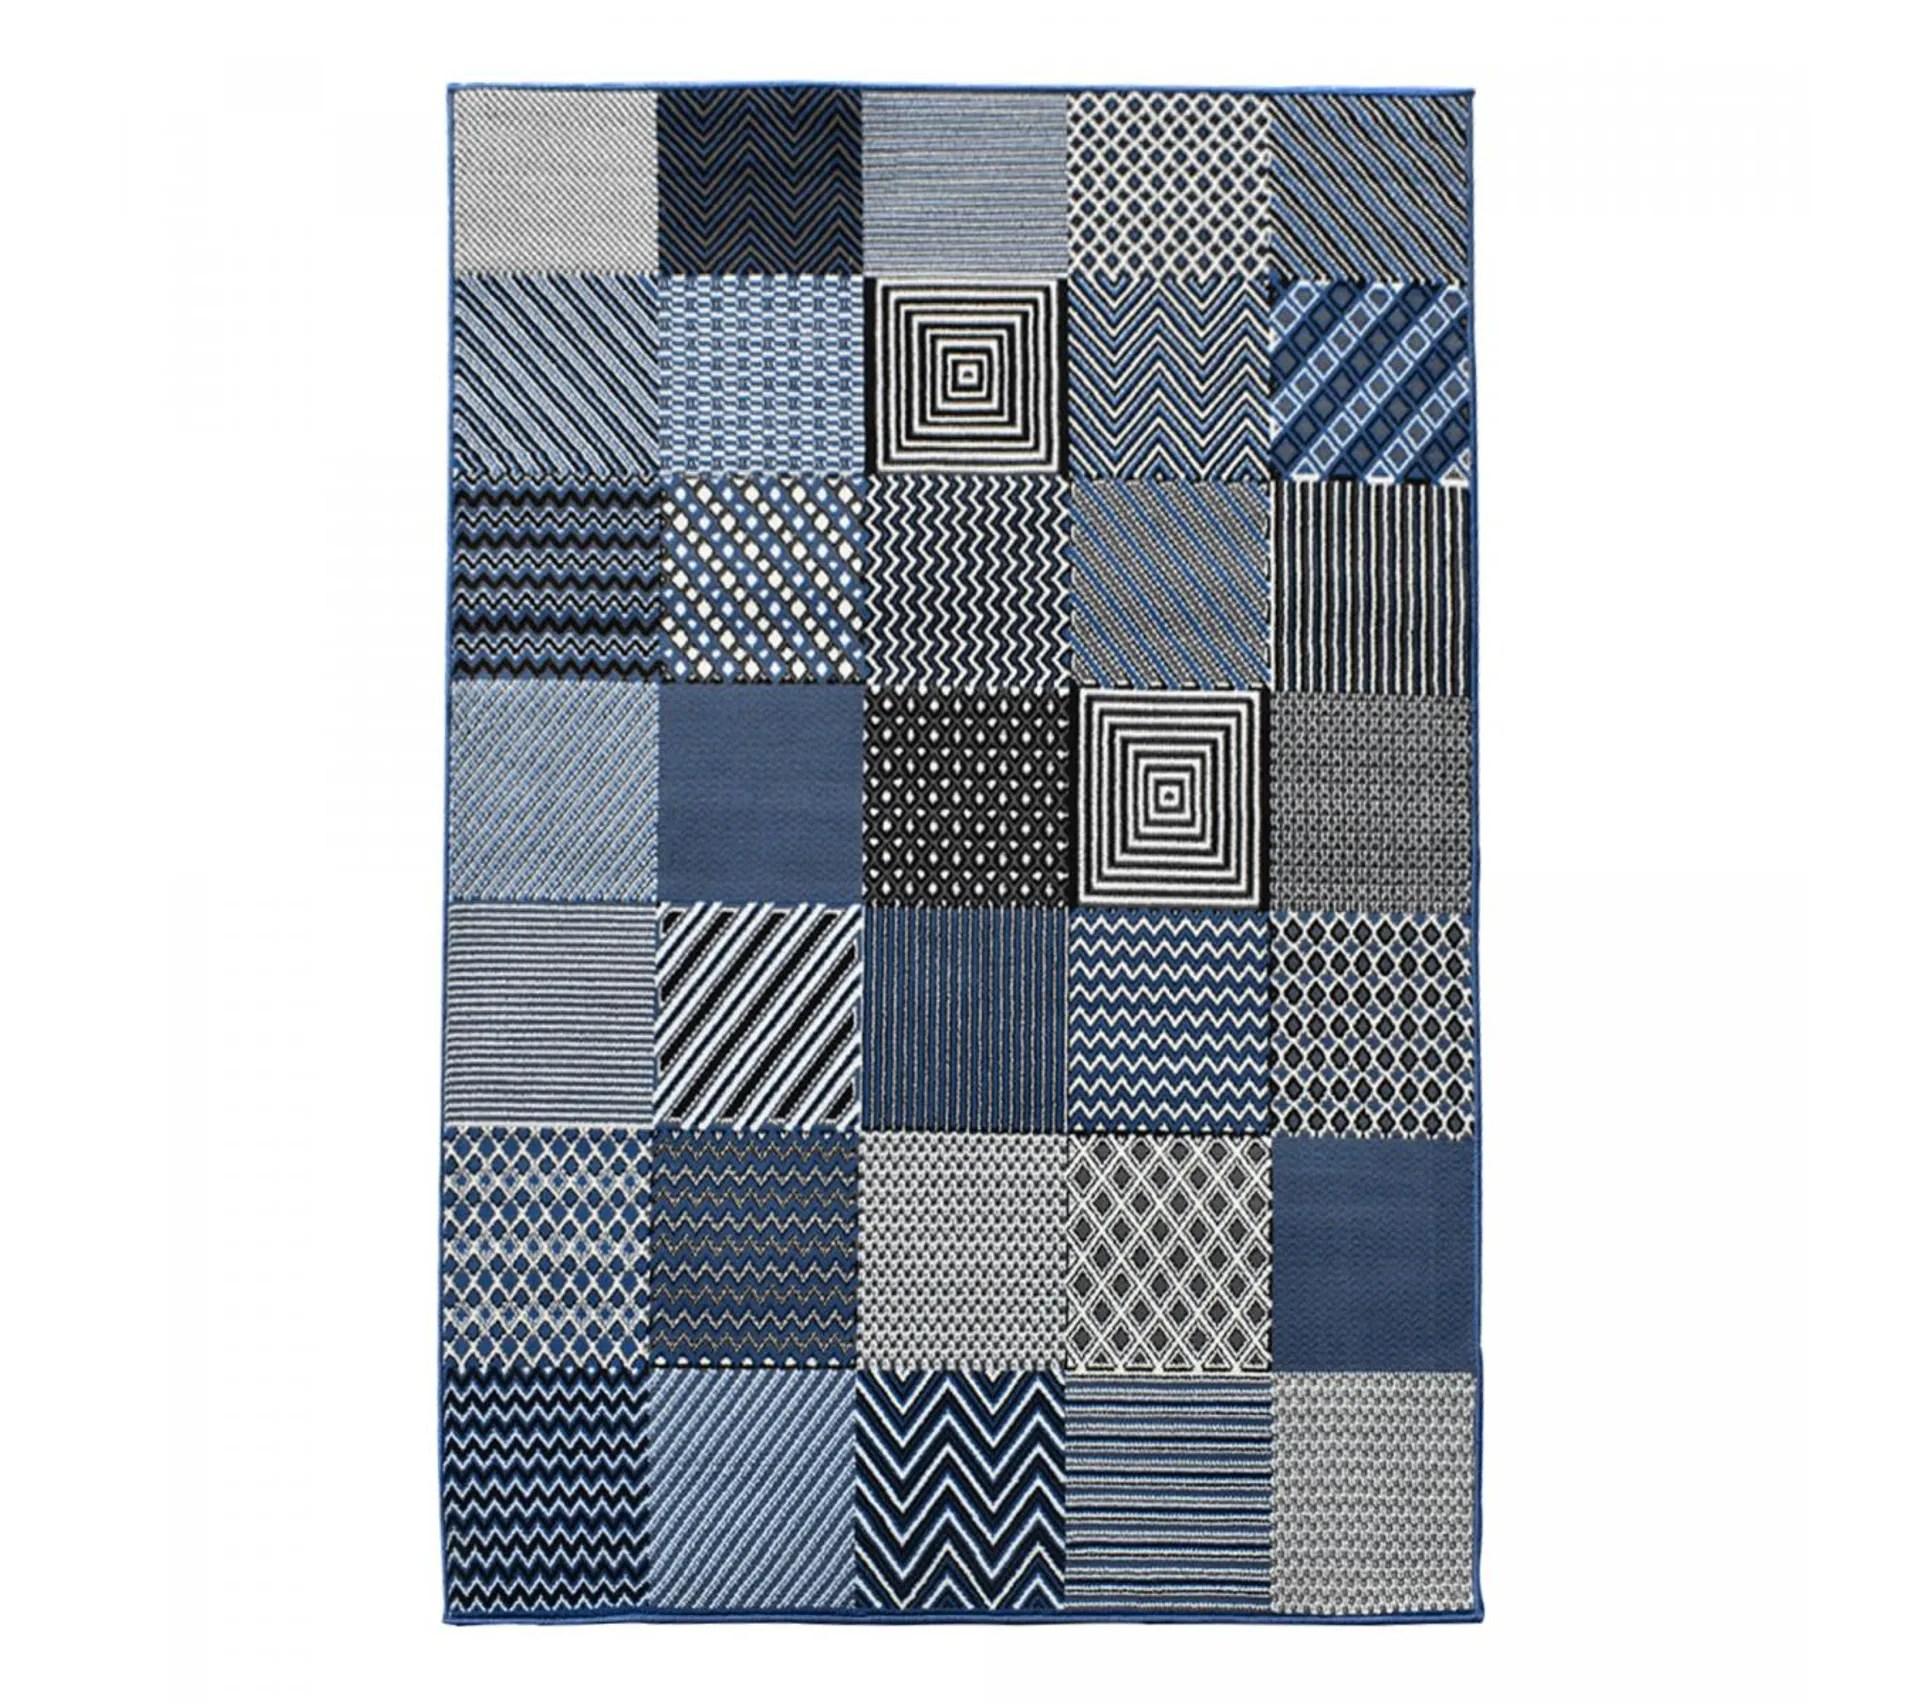 200x290 tapis design et moderne rectangulaire bc geotrem bleu